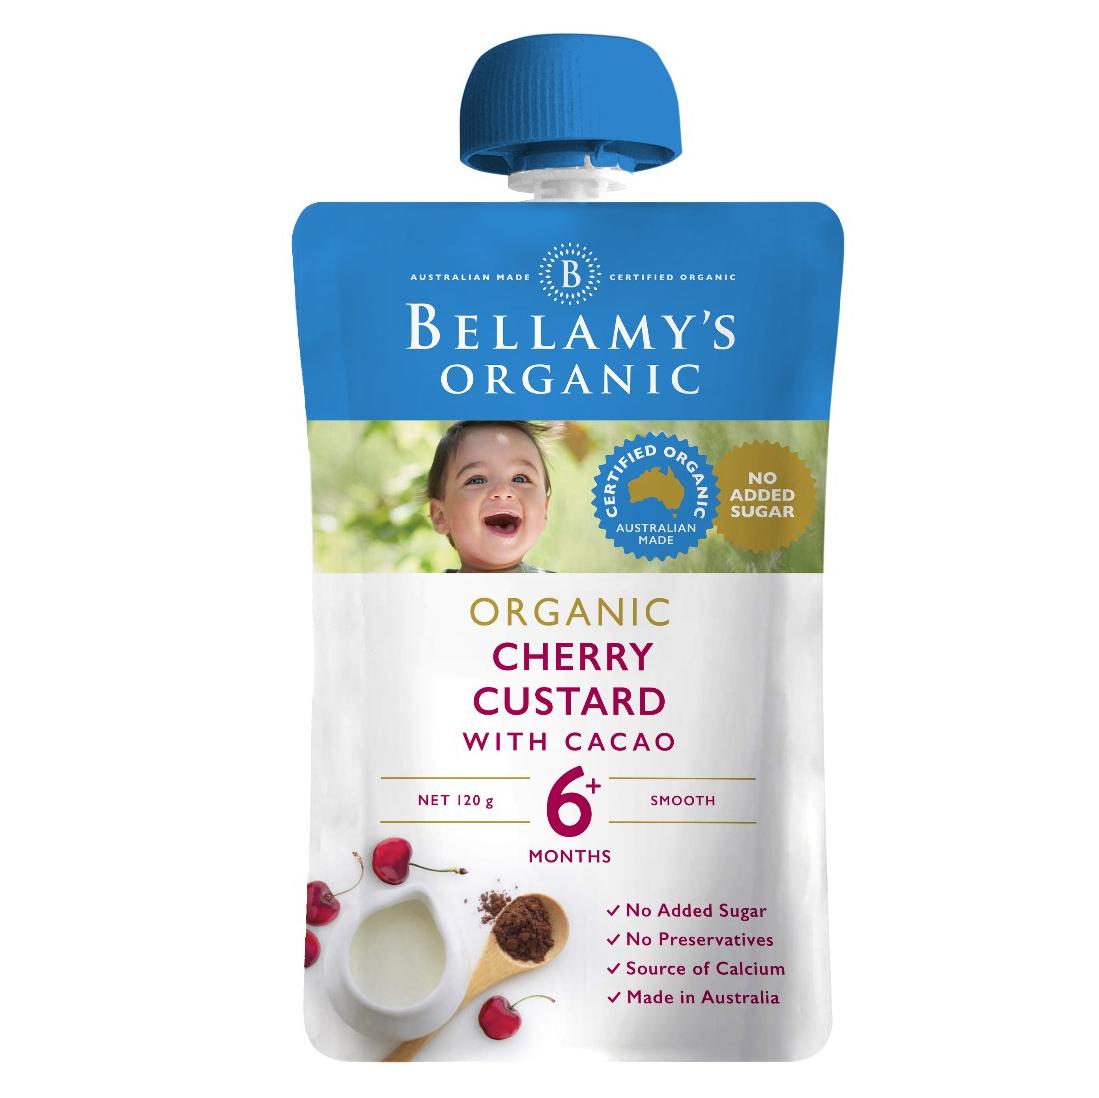 Bellamy's Organic Cherry Custard with Cacao 120g